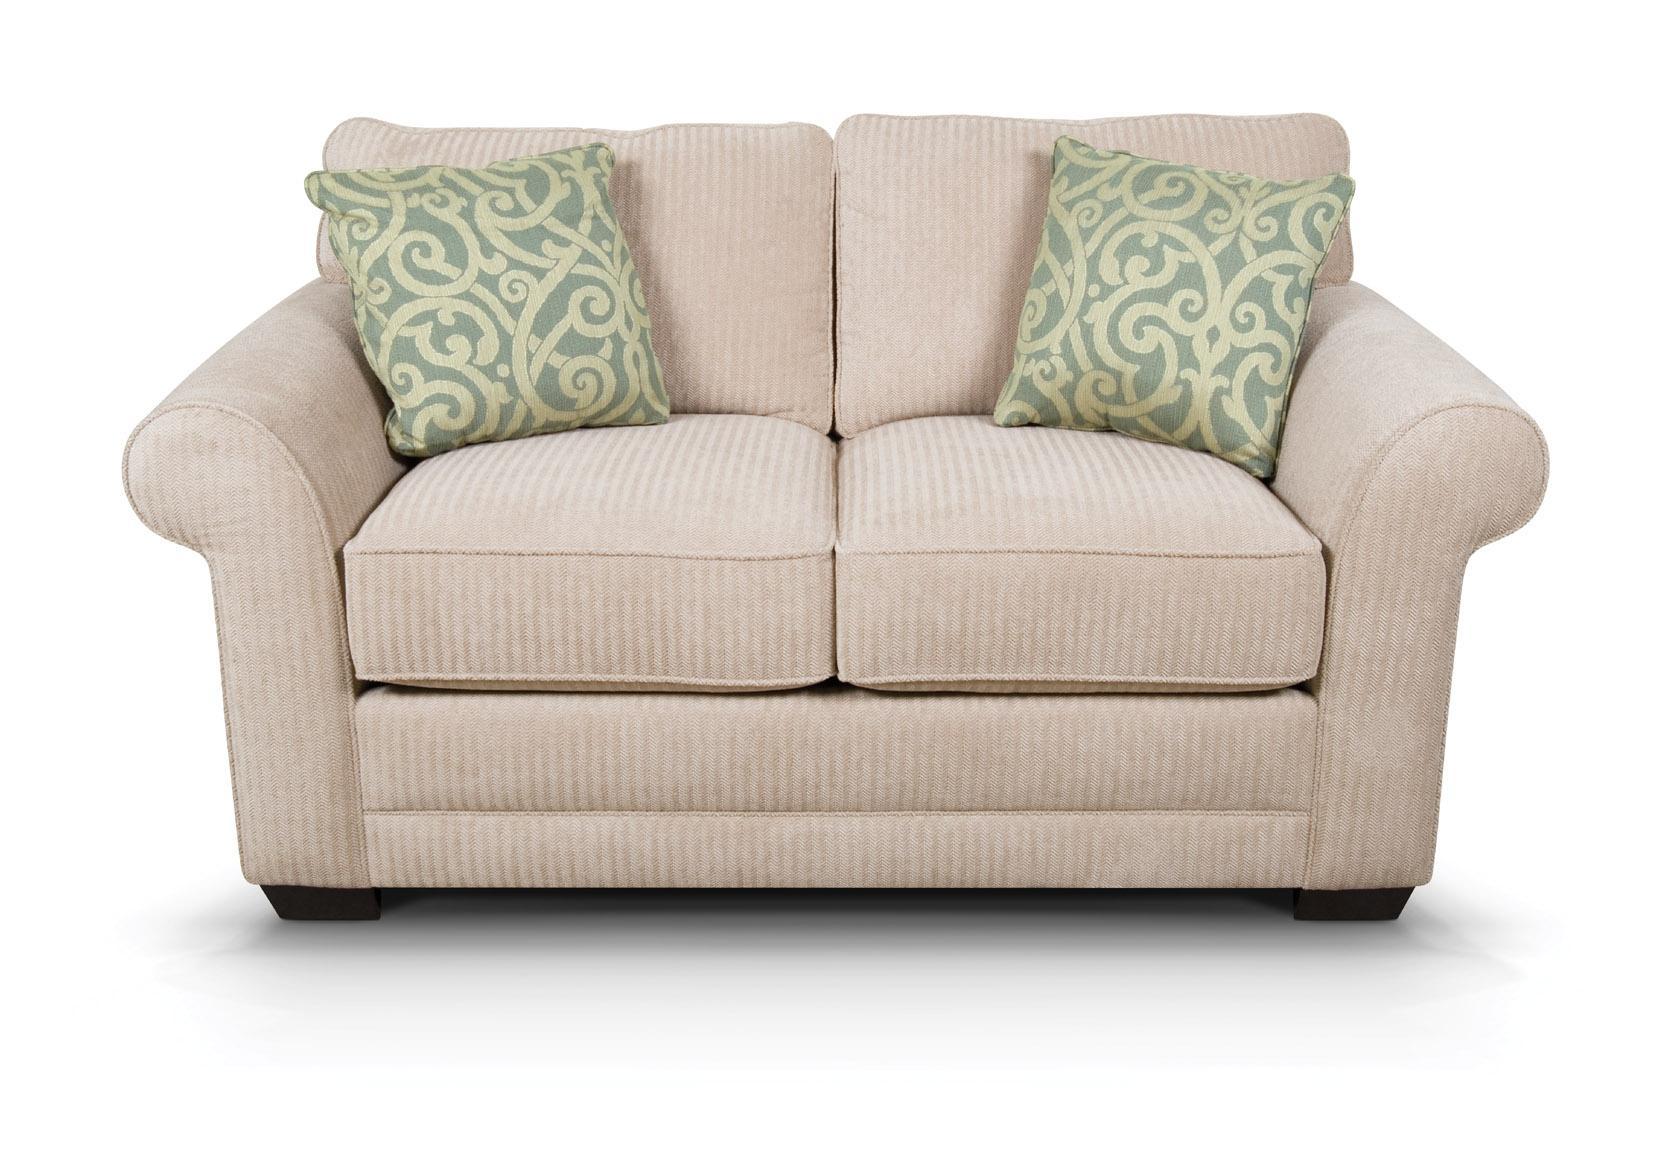 England Brantley Love Seat - Item Number: 5636